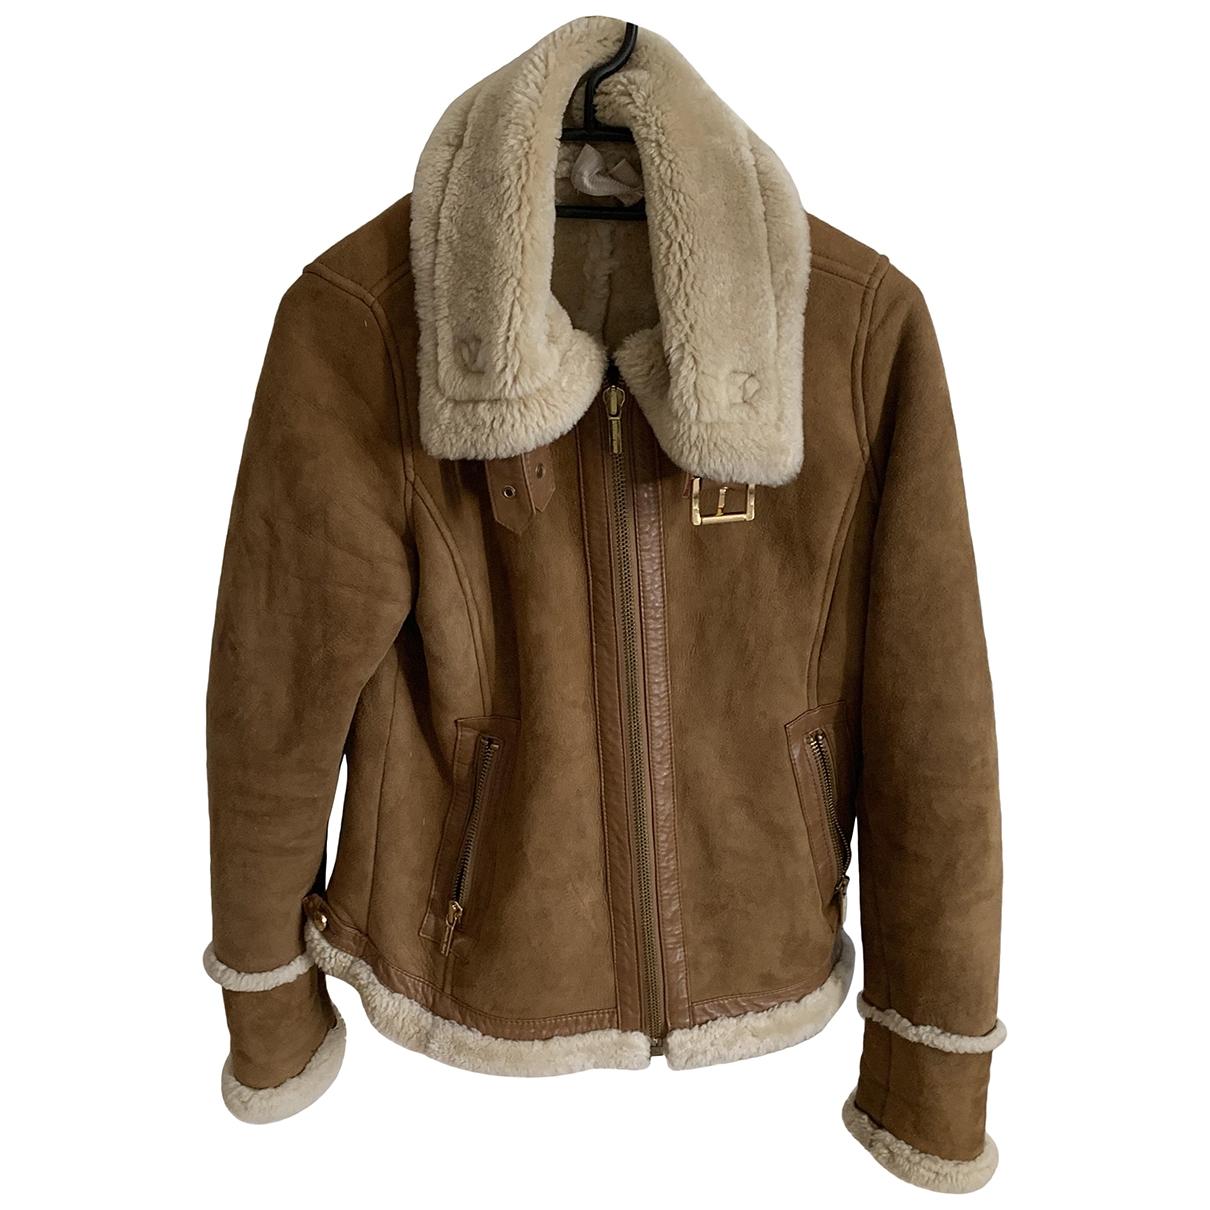 Michael Kors \N Brown Shearling coat for Women S International